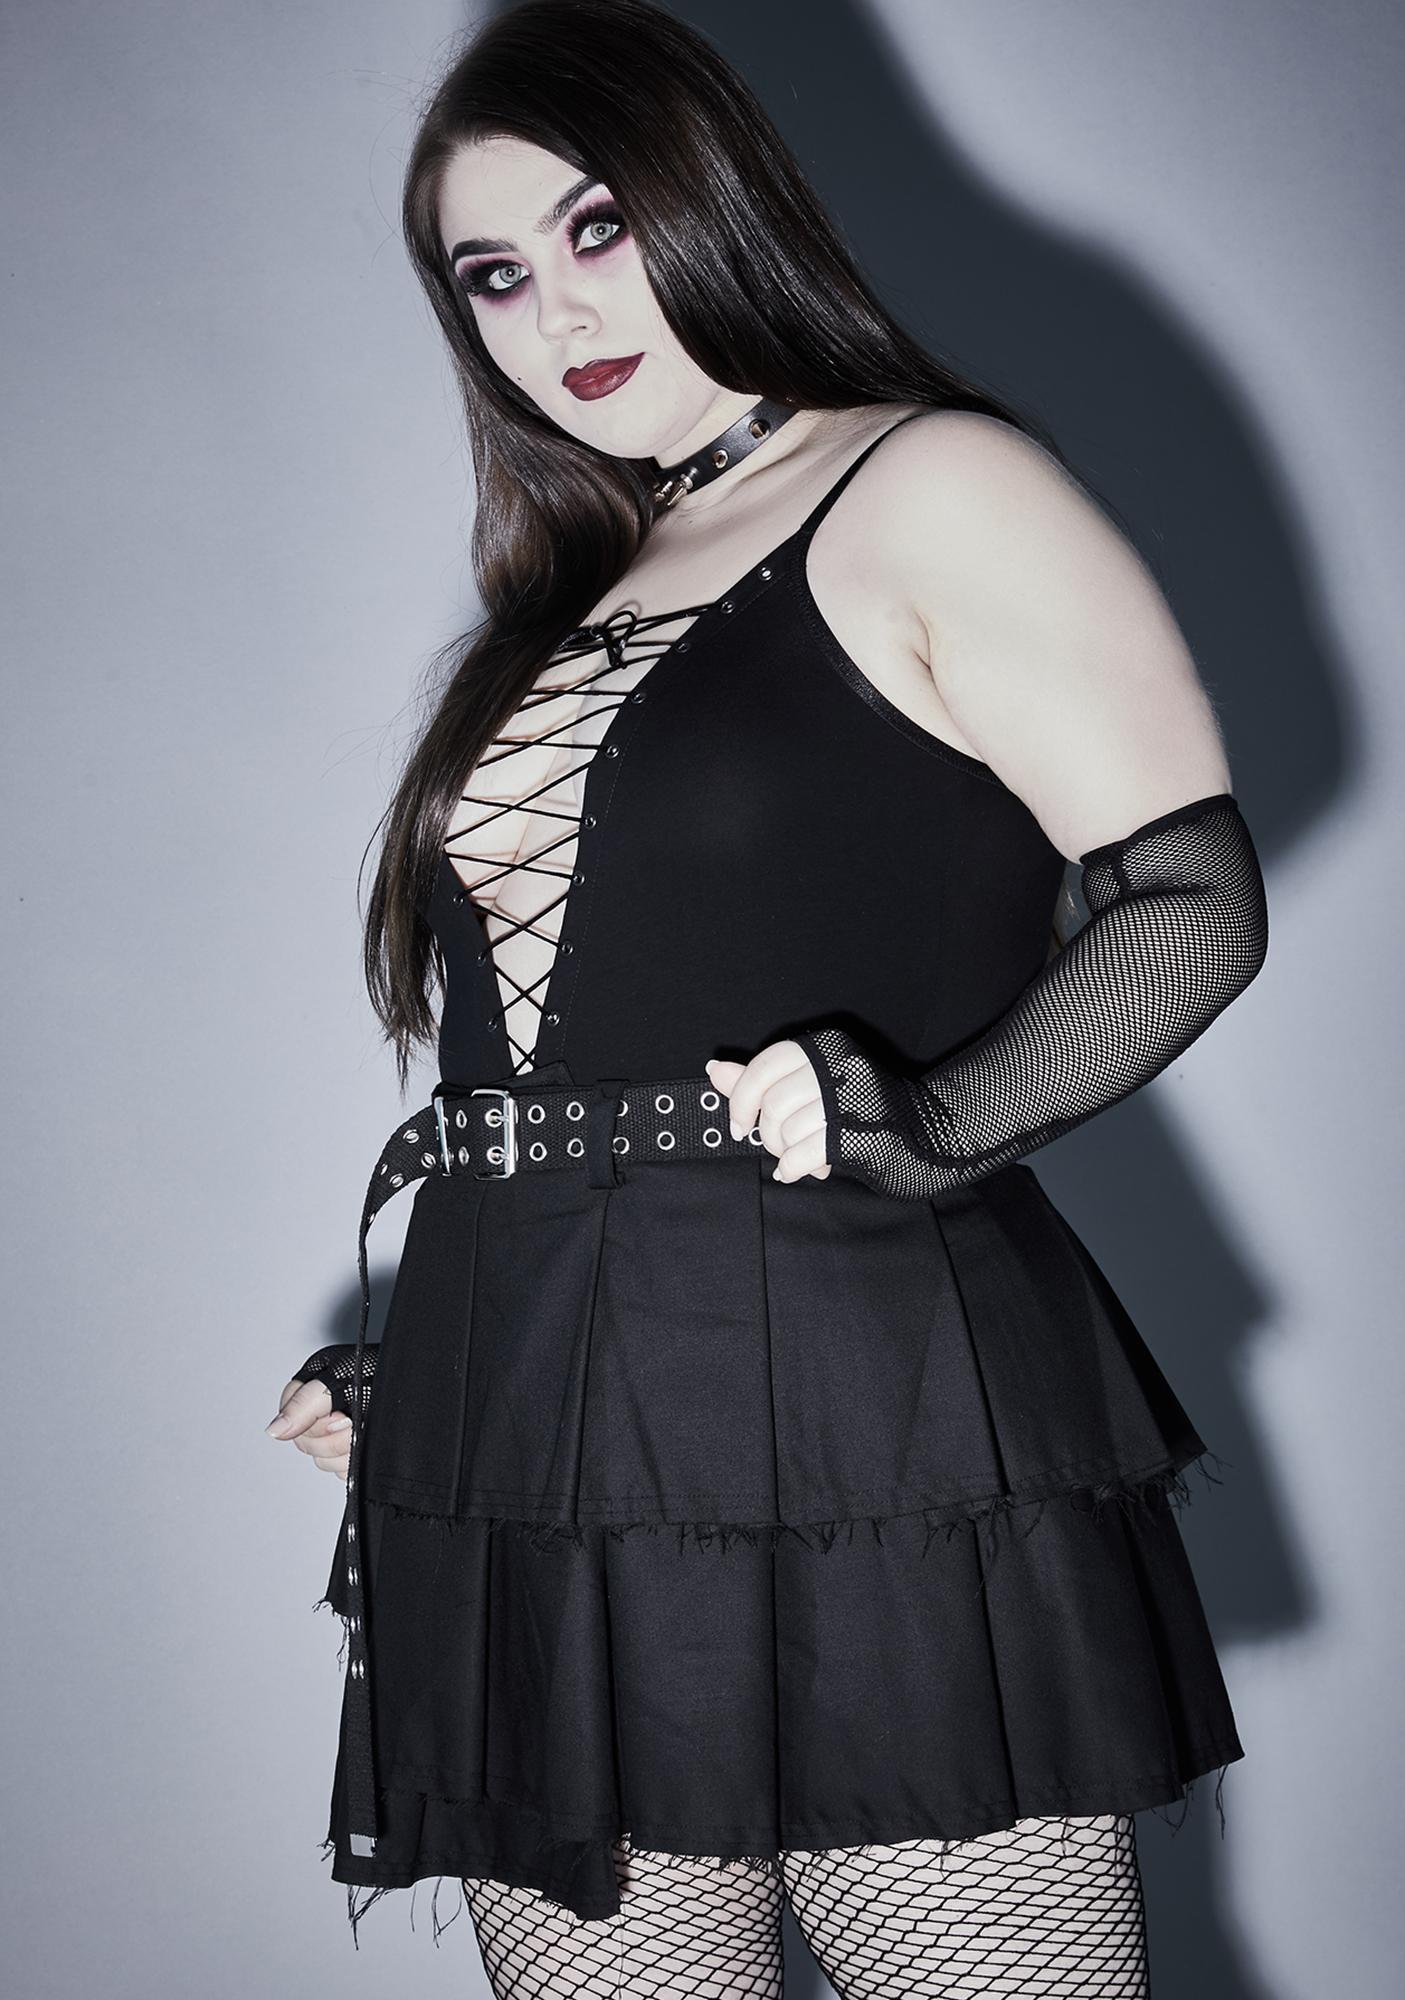 Widow Infernal Vicious Mischief Lace Up Bodysuit